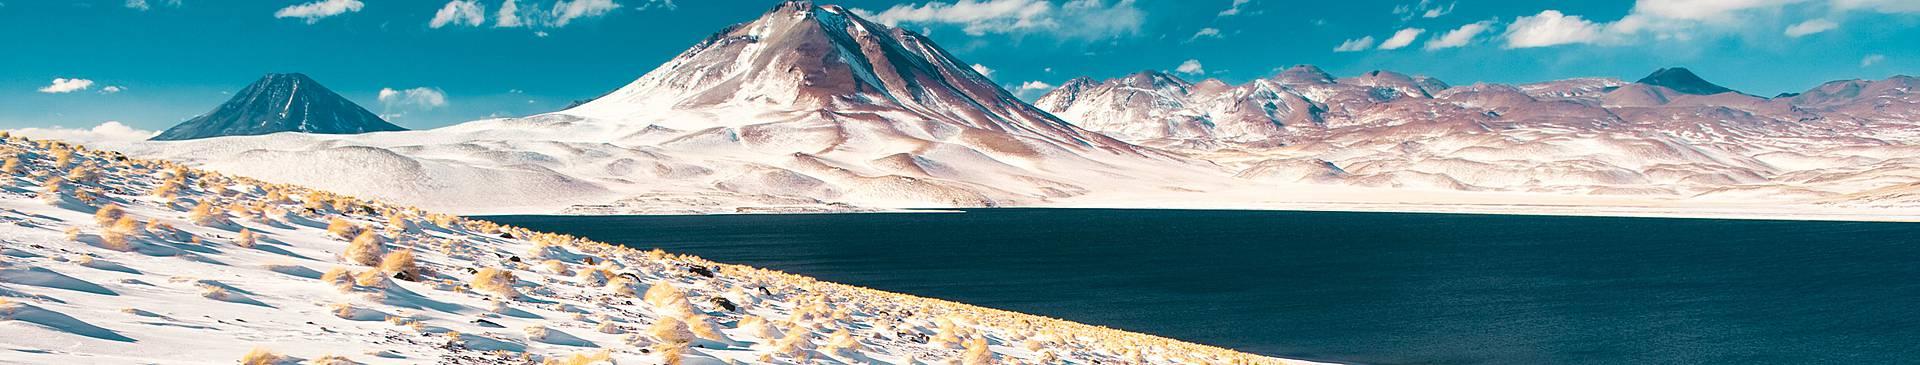 Circuits d'Hiver au Chili